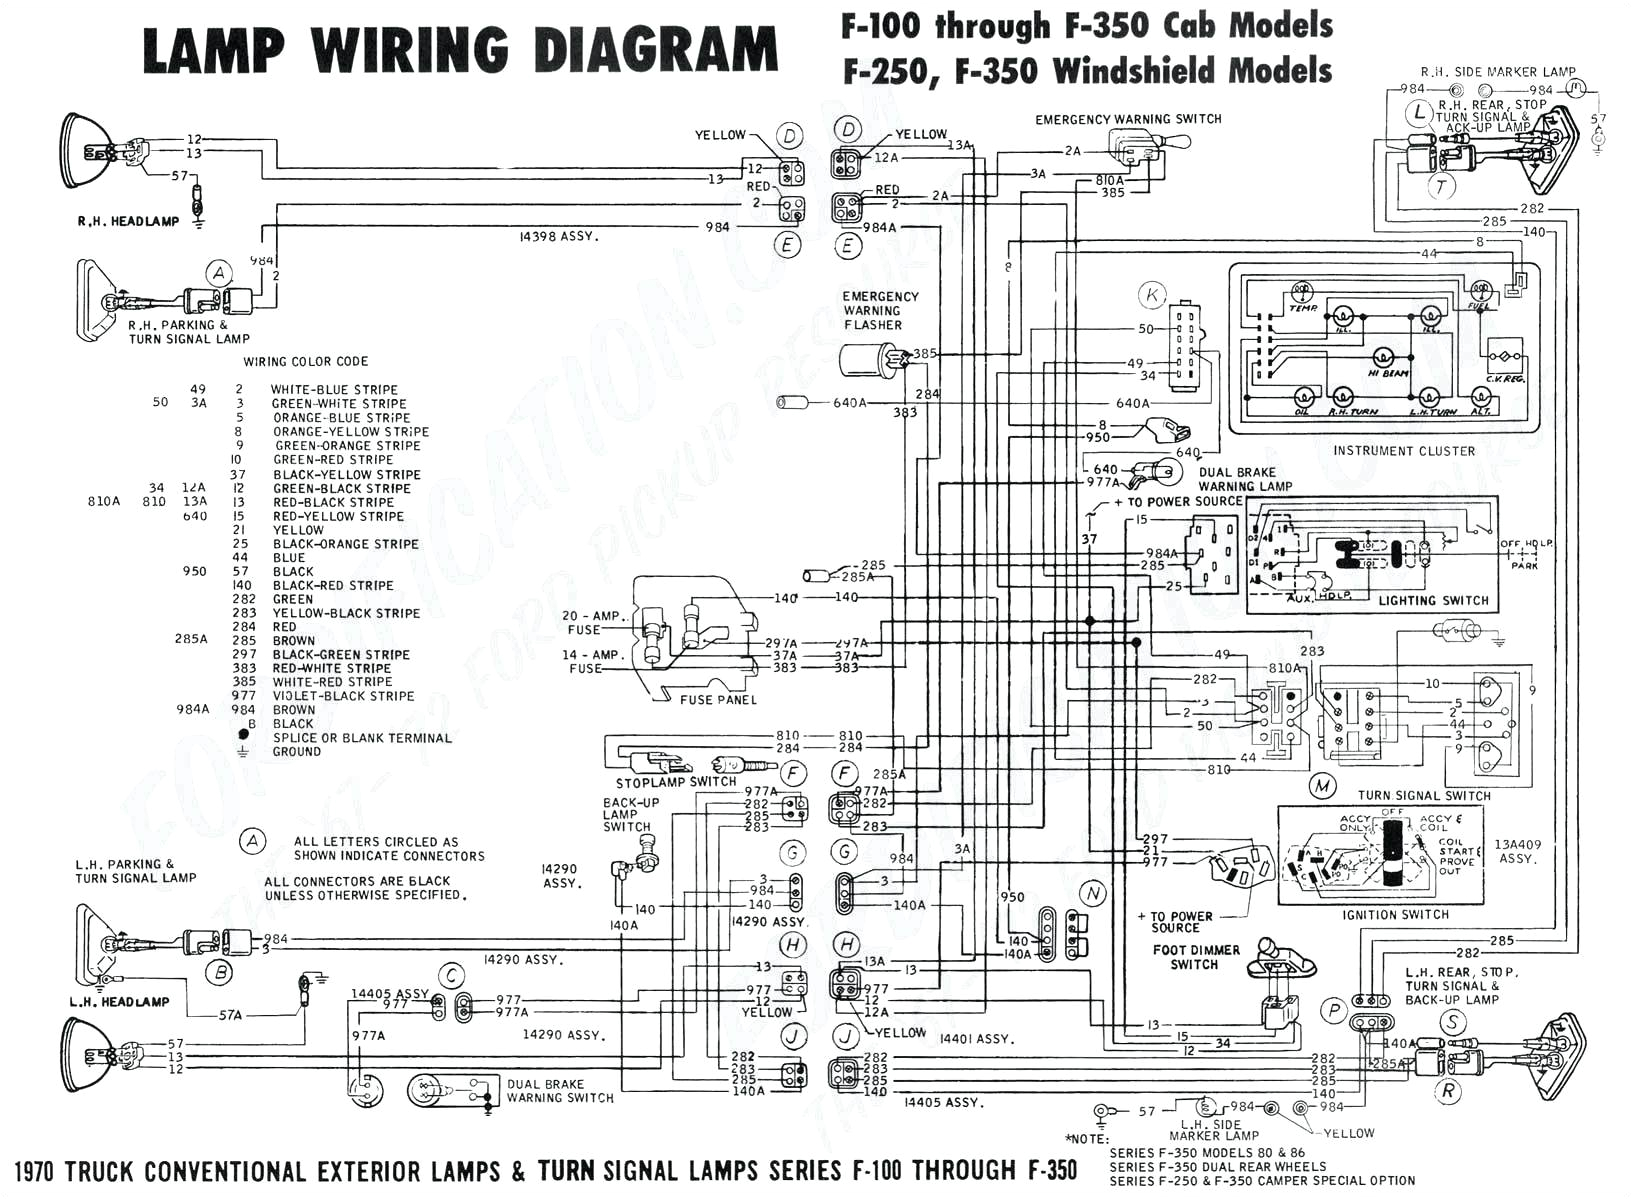 2008 ford F250 Trailer Plug Wiring Diagram 1999 ford F 250 Wiring Diagram as Well Diagram Base Website